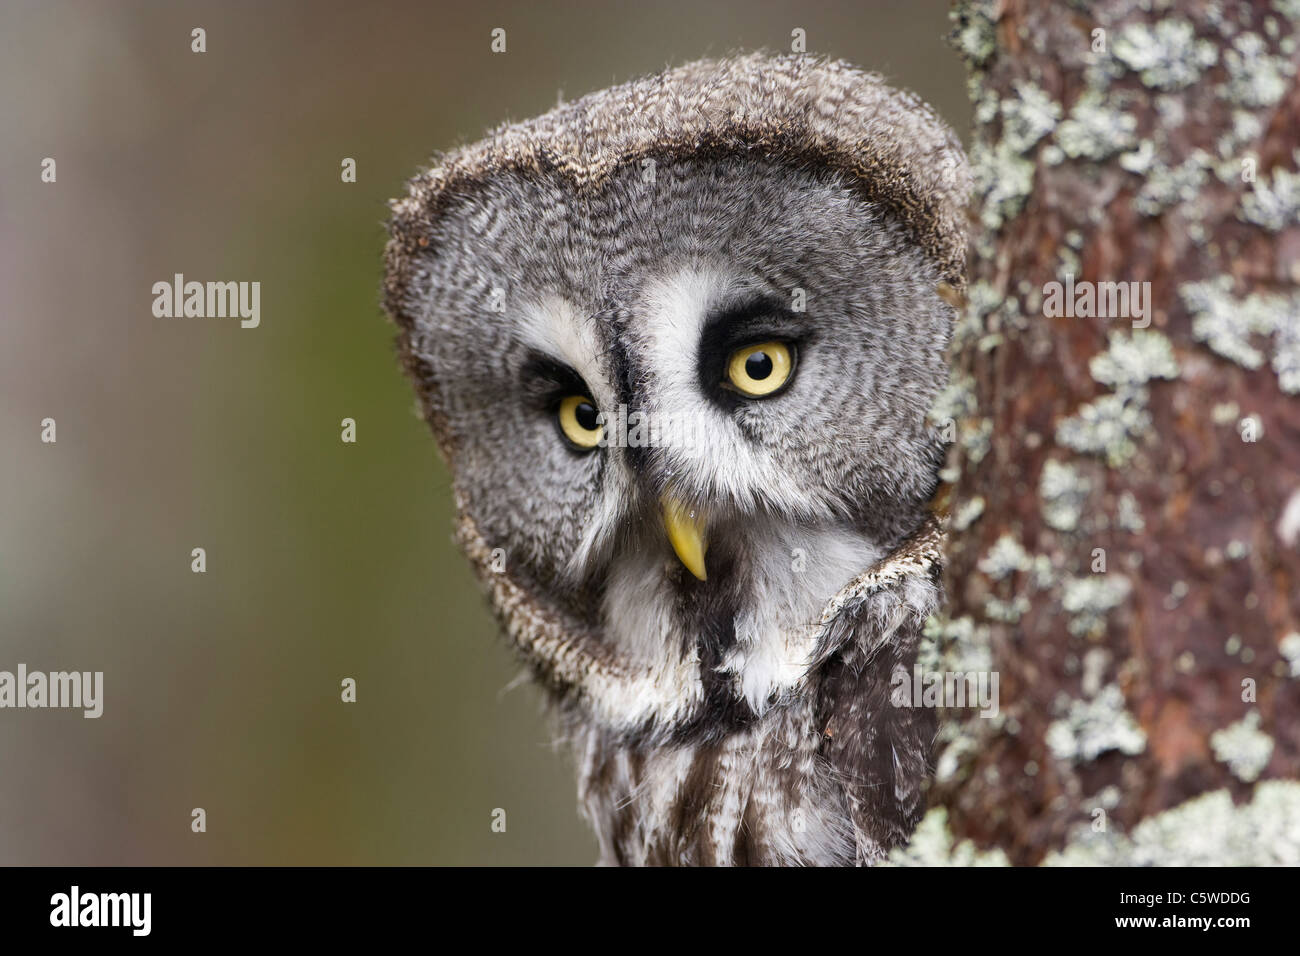 Great Grey Owl, Lapland Owl (Strix nebulosa), peering around tree. - Stock Image